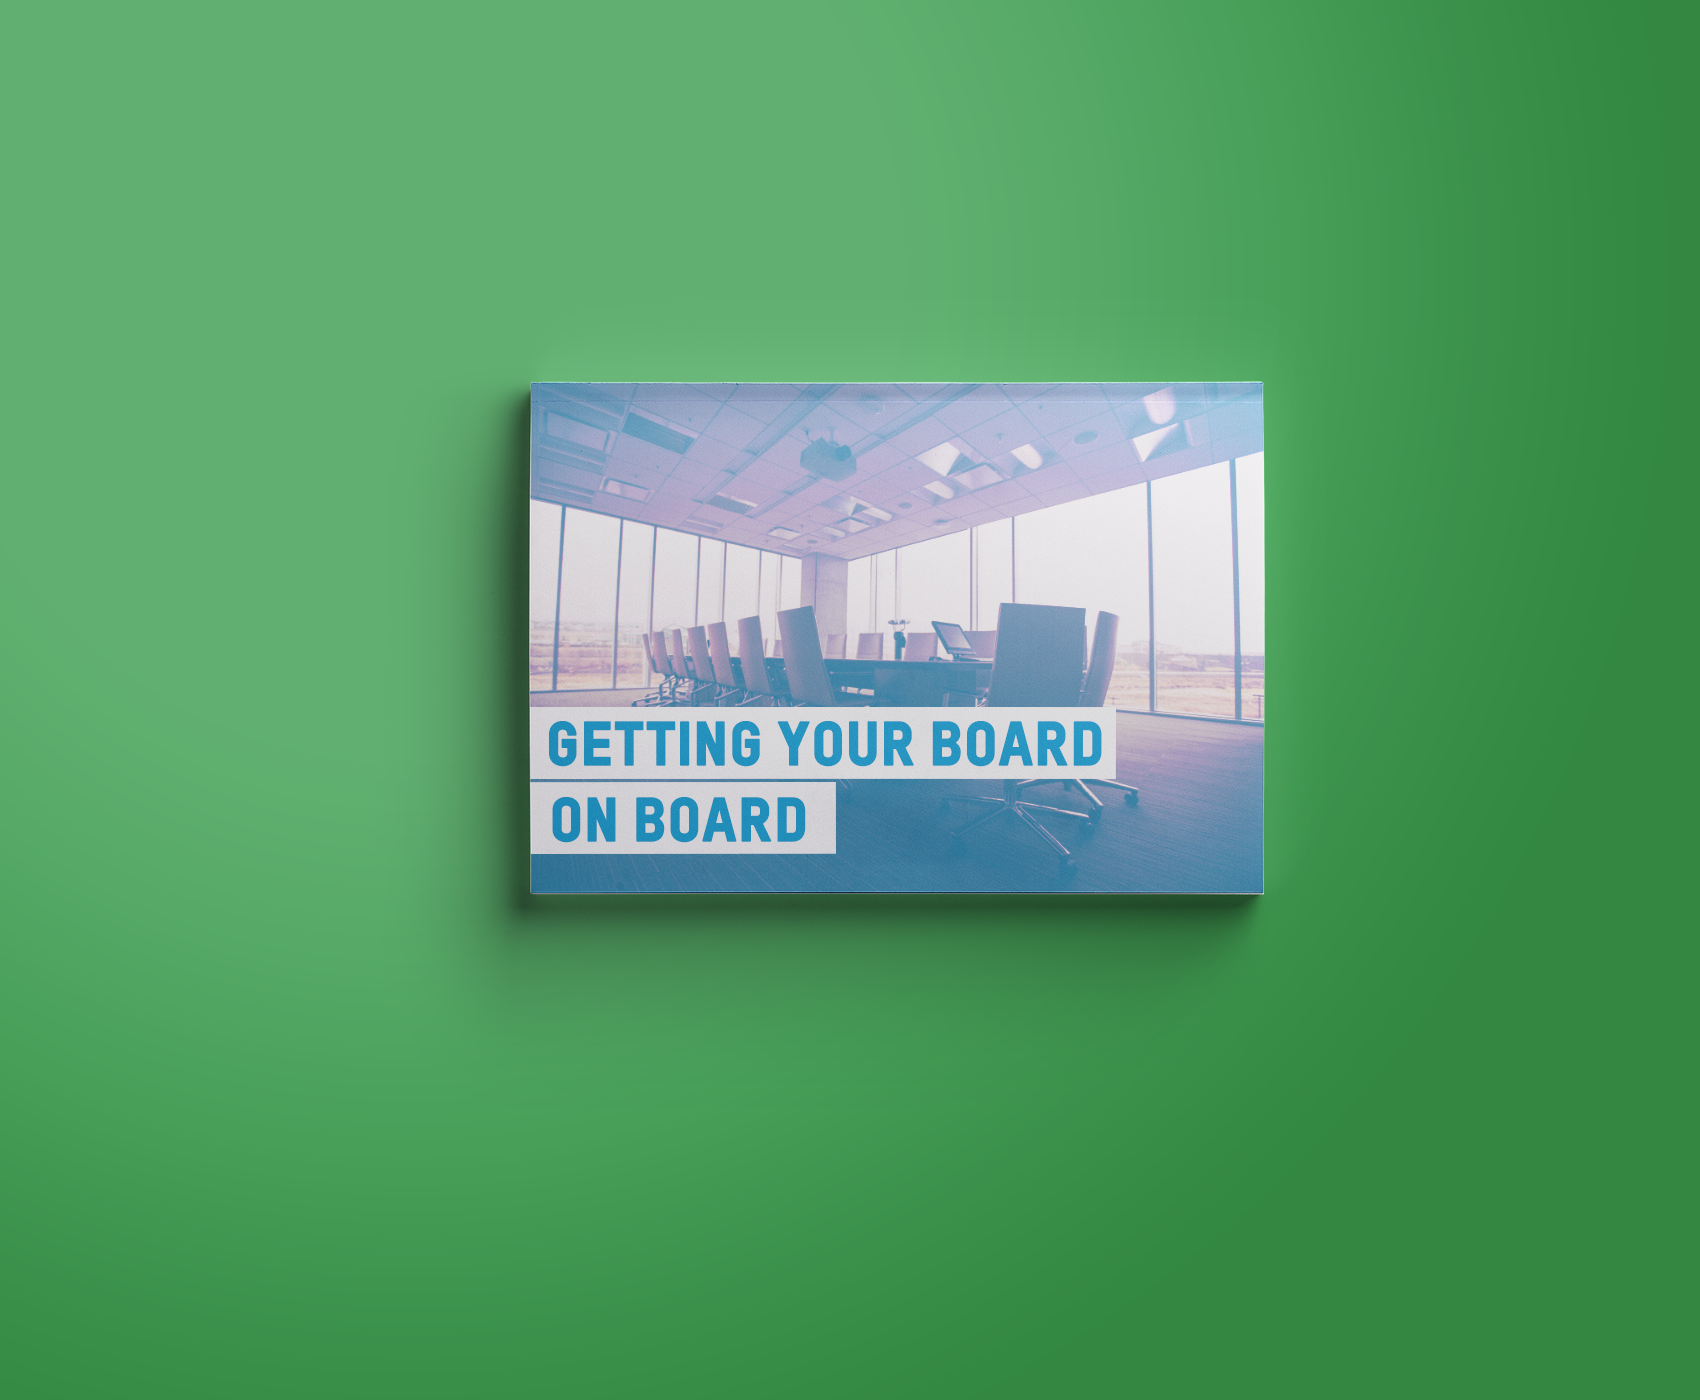 board_on_board_bg-1